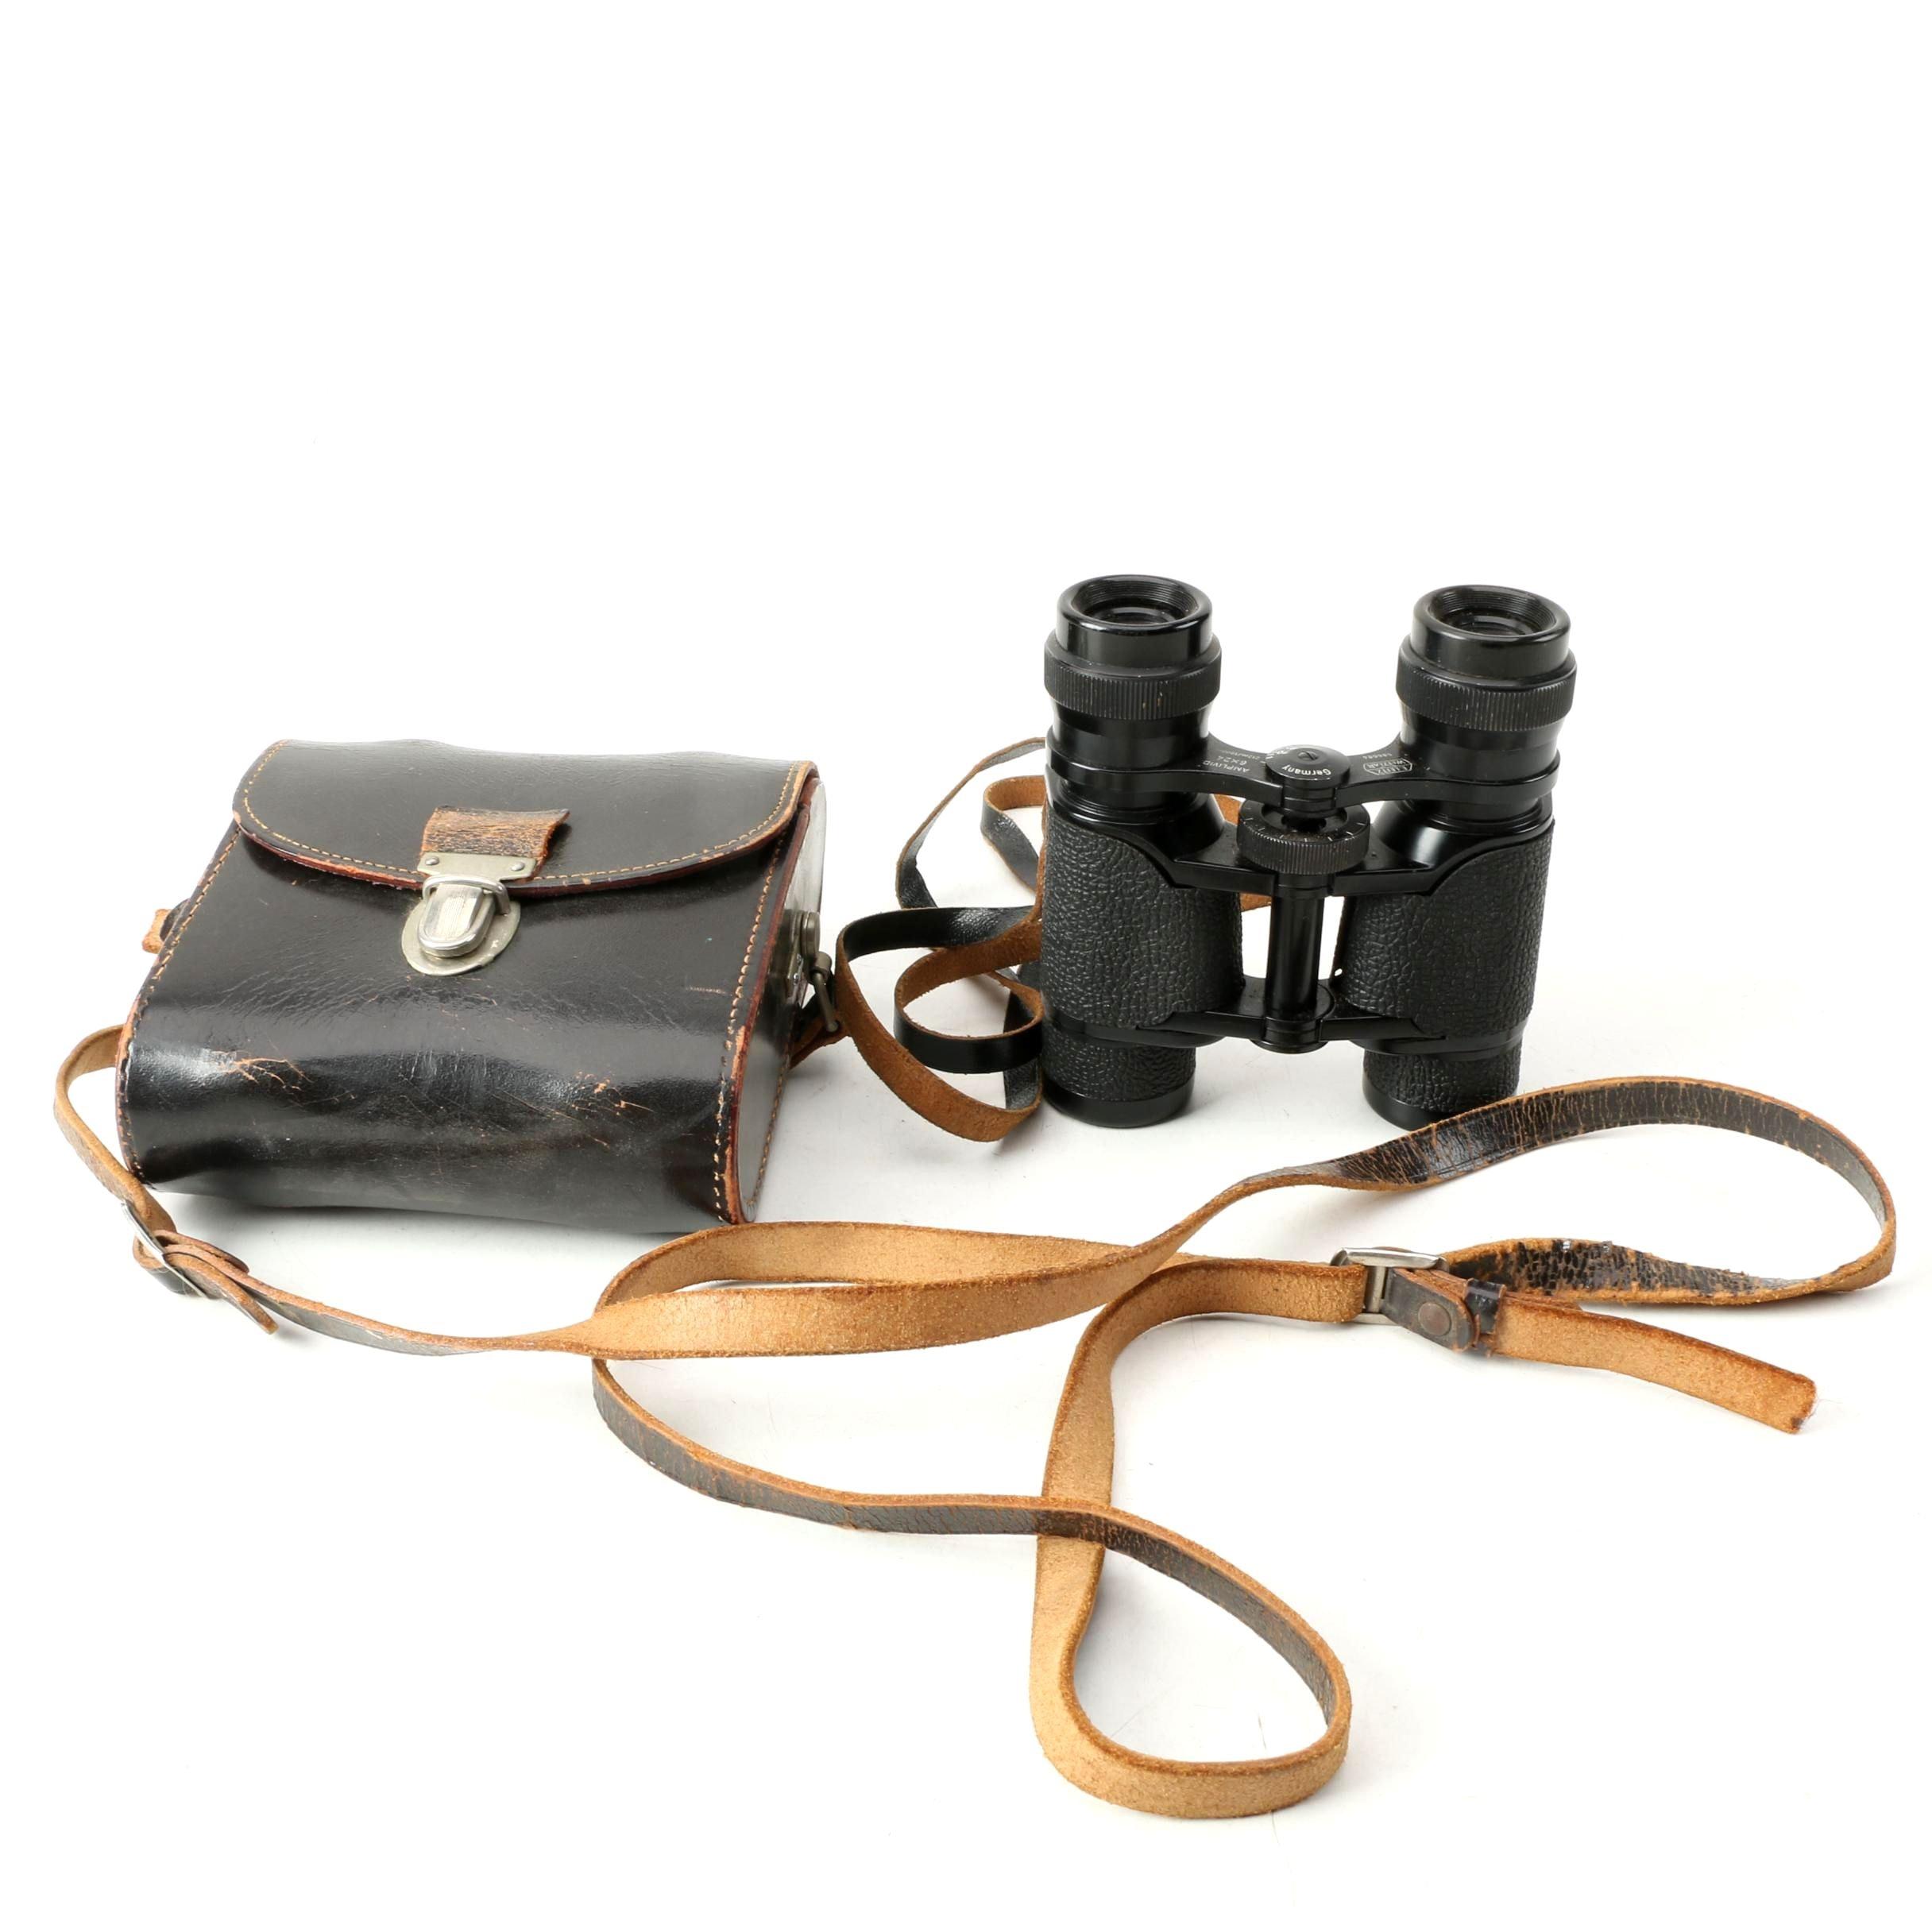 Vintage E. Leitz Wetzlar Amplivid 6x24 Binoculars with Leather Case